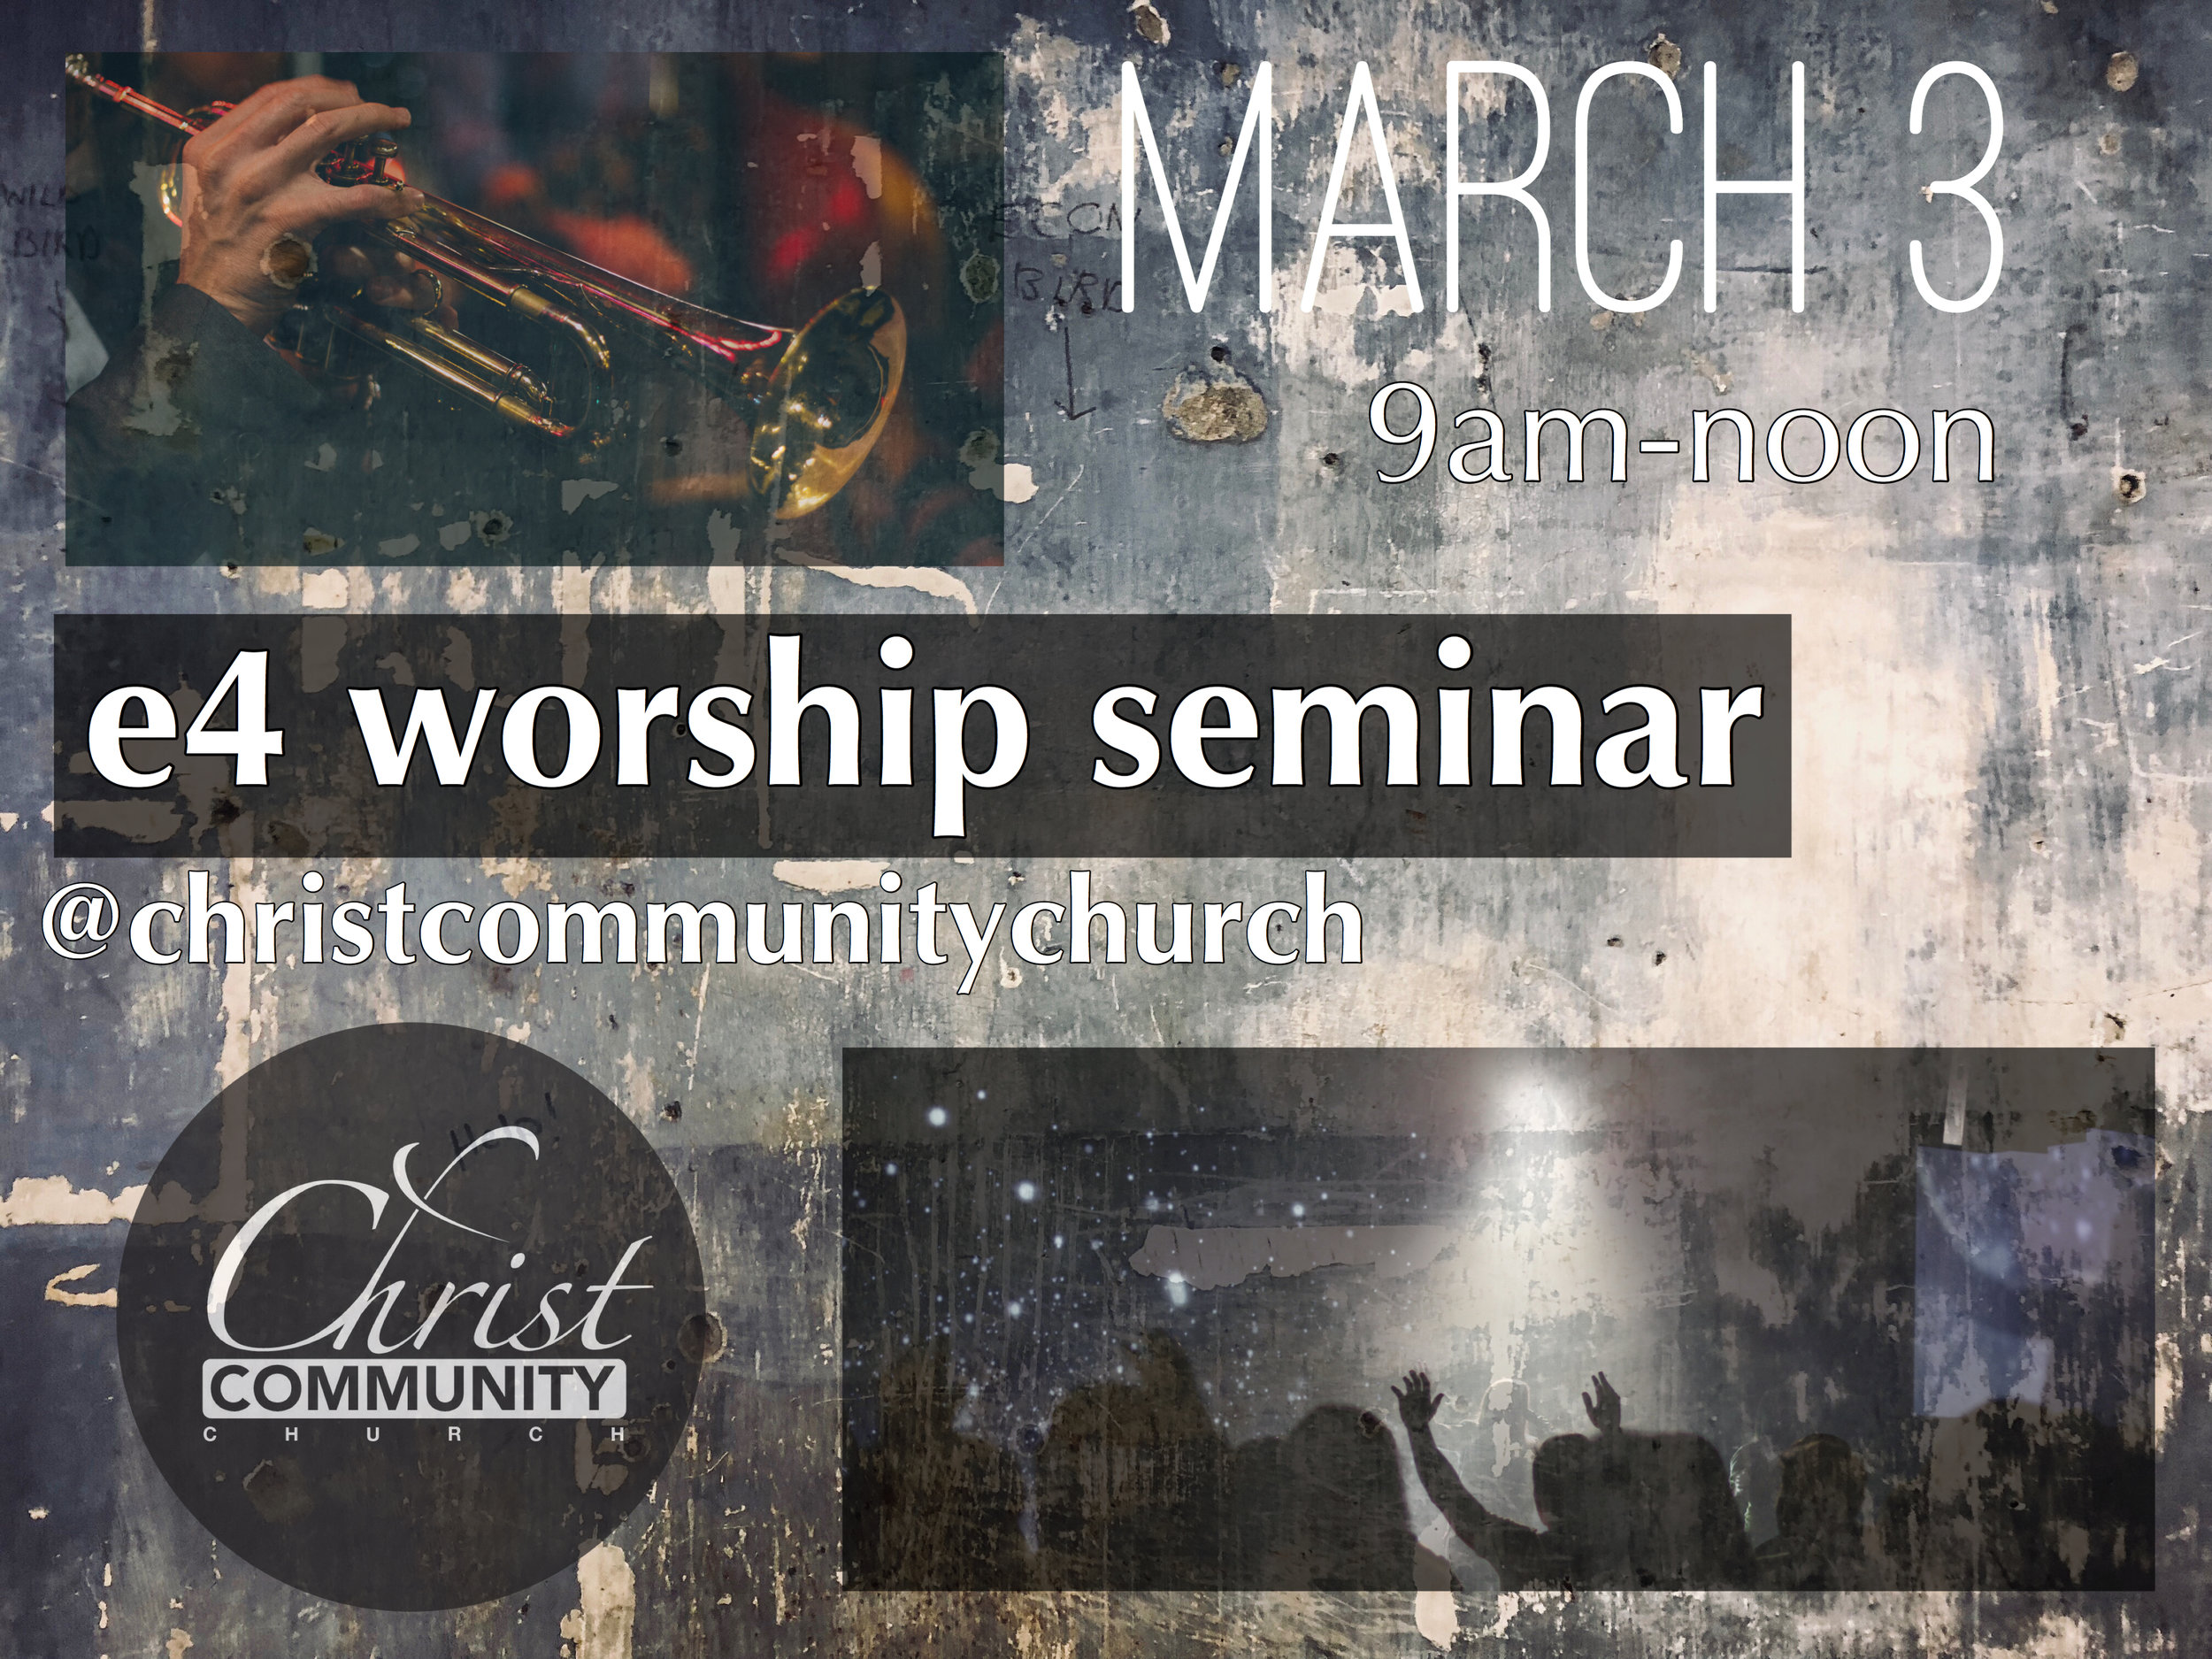 e4 Worship Seminar - Registration now open!